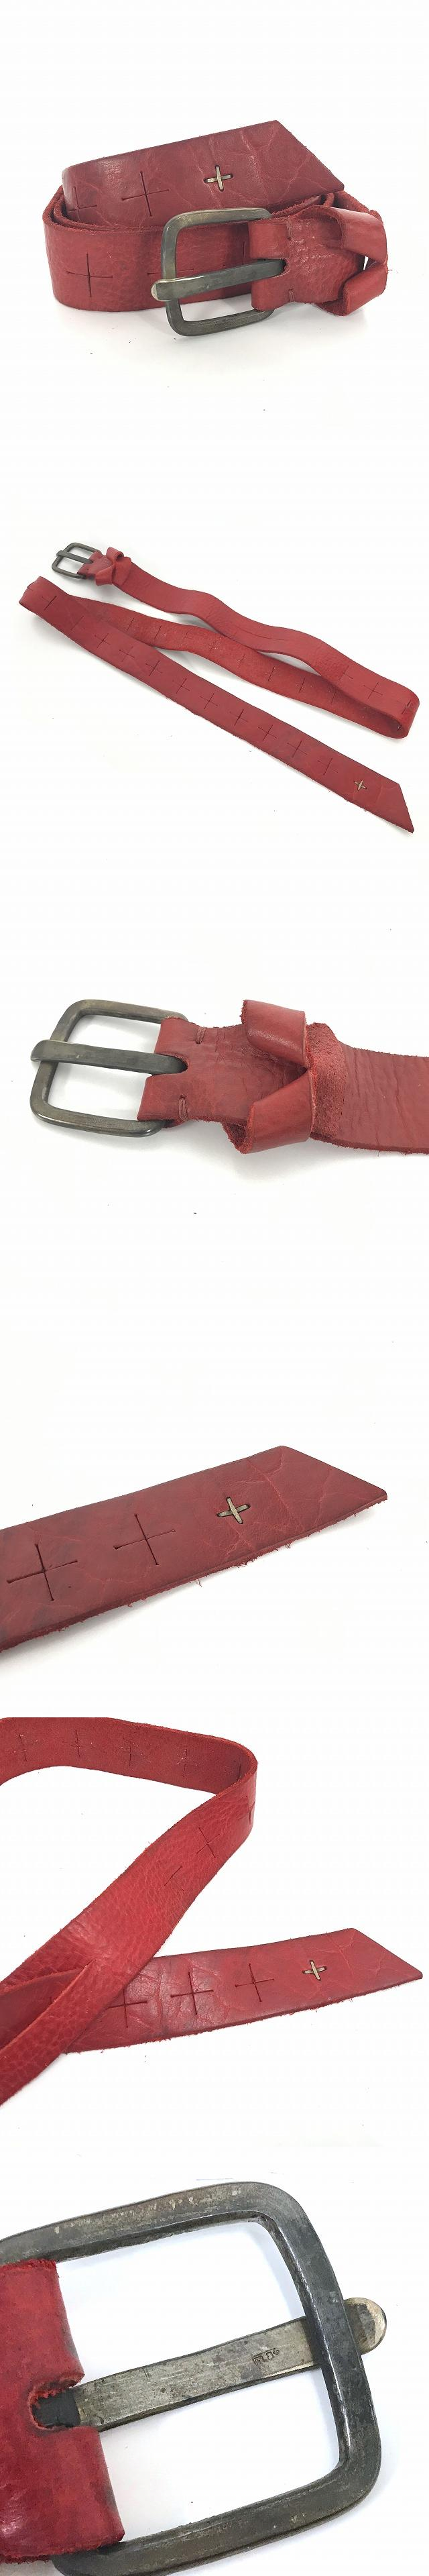 18SS クロスカット パイソンレザー ワイドベルト d buckle cross cuts wide belt 赤 レッド ED2E-Bl3,0